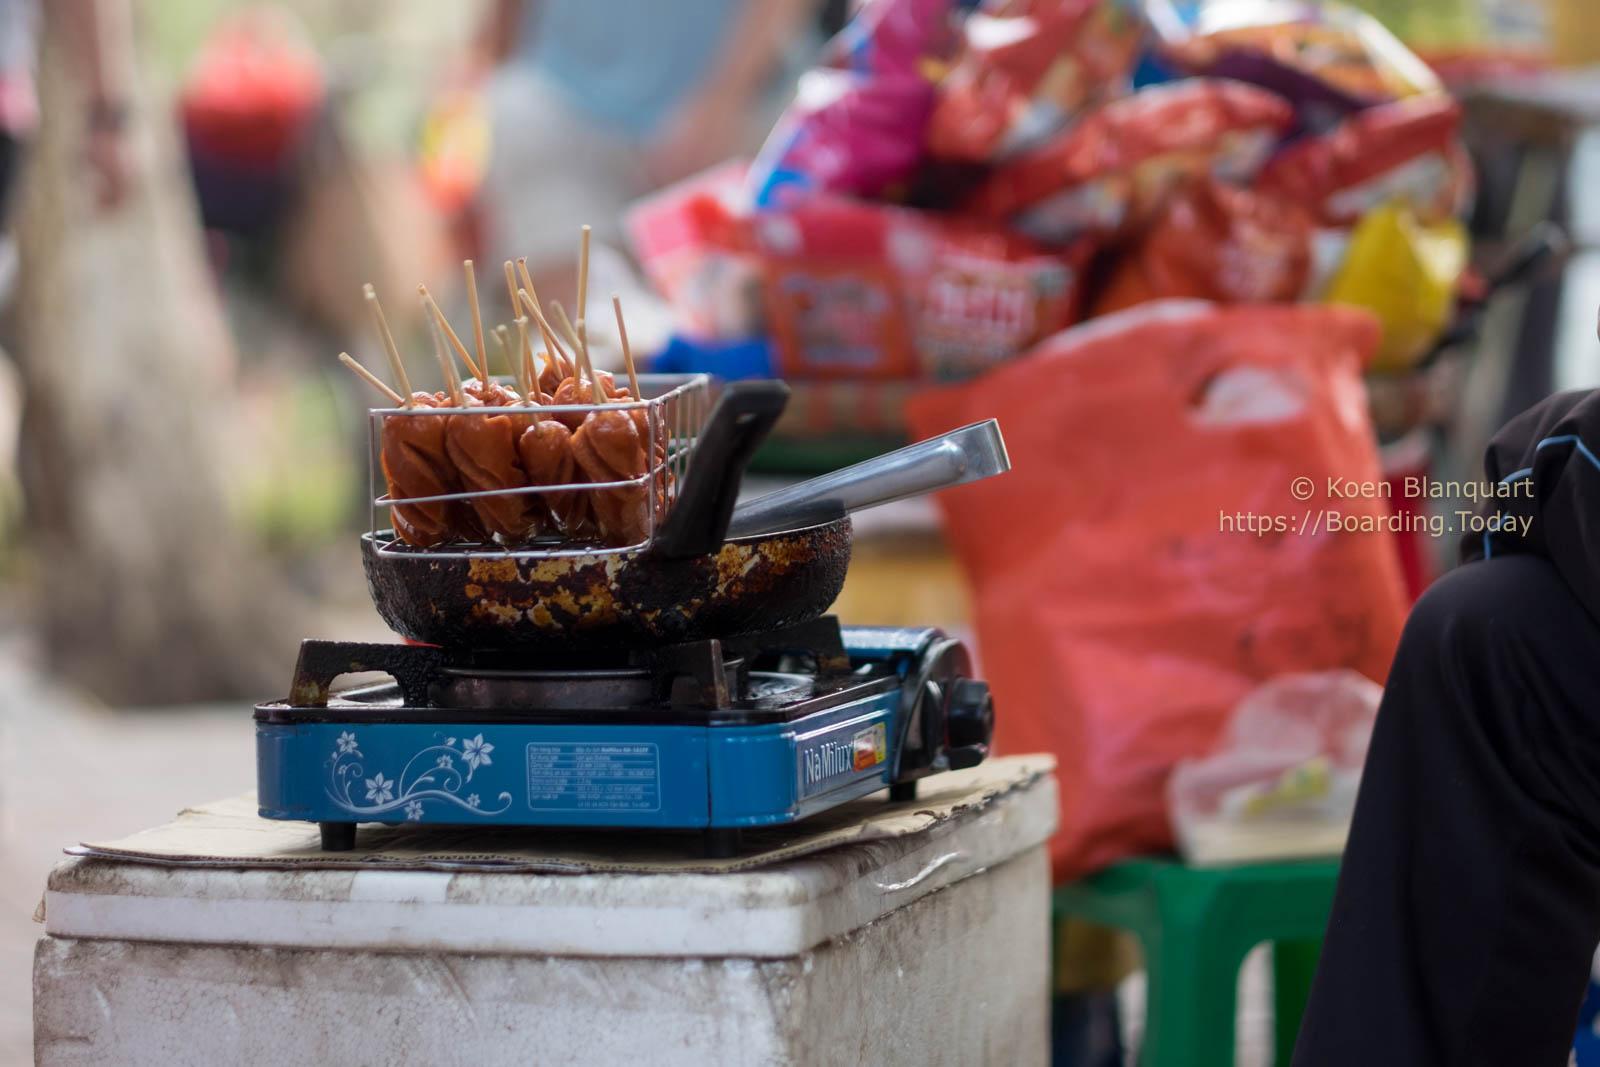 20170130-DSCF6771Hanoi, Vietnam by Koen Blanquart for Boarding.Today.jpg